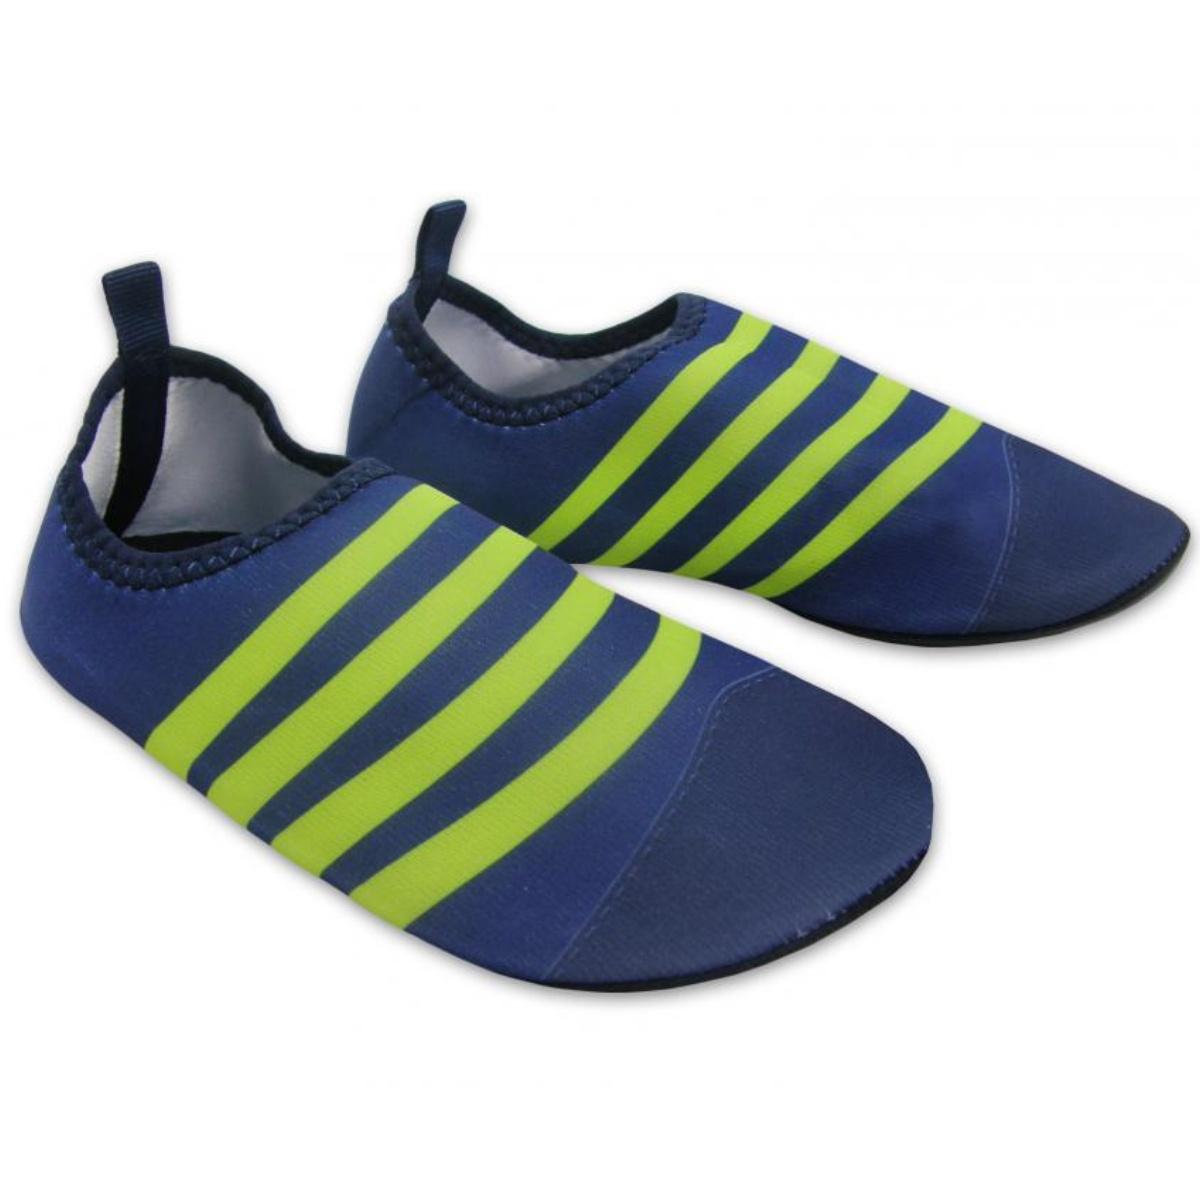 Topánky do vody SEDCO Strips modré